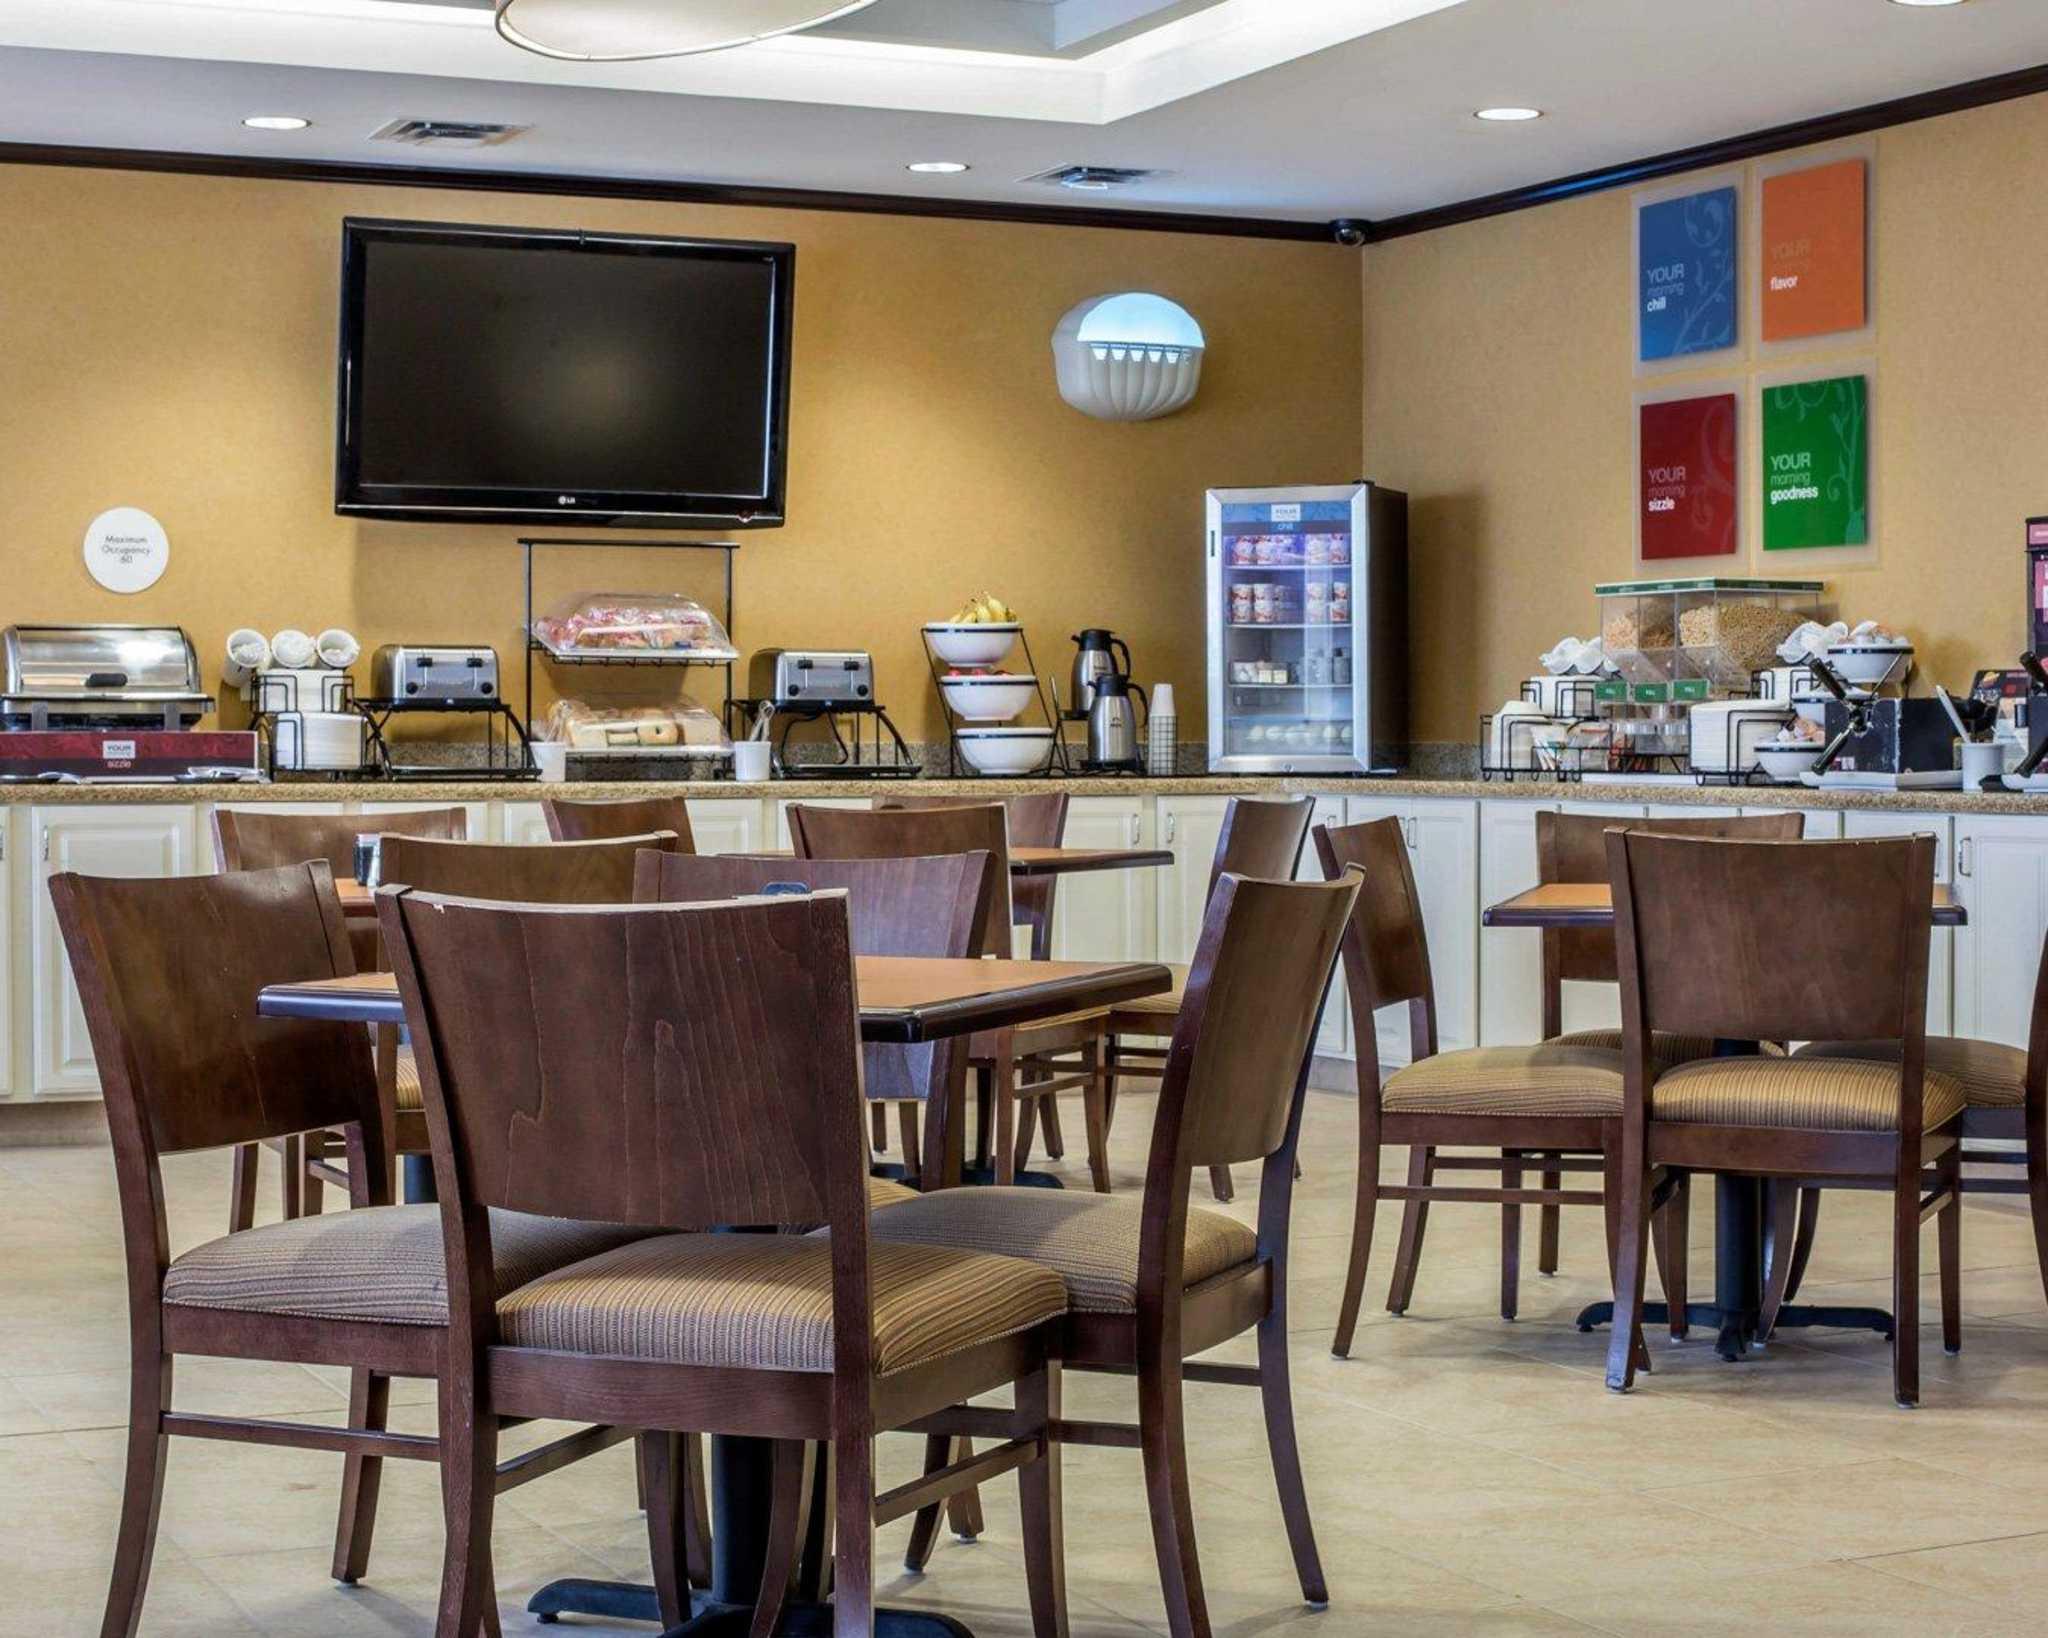 Comfort Inn & Suites adj to Akwesasne Mohawk Casino image 36